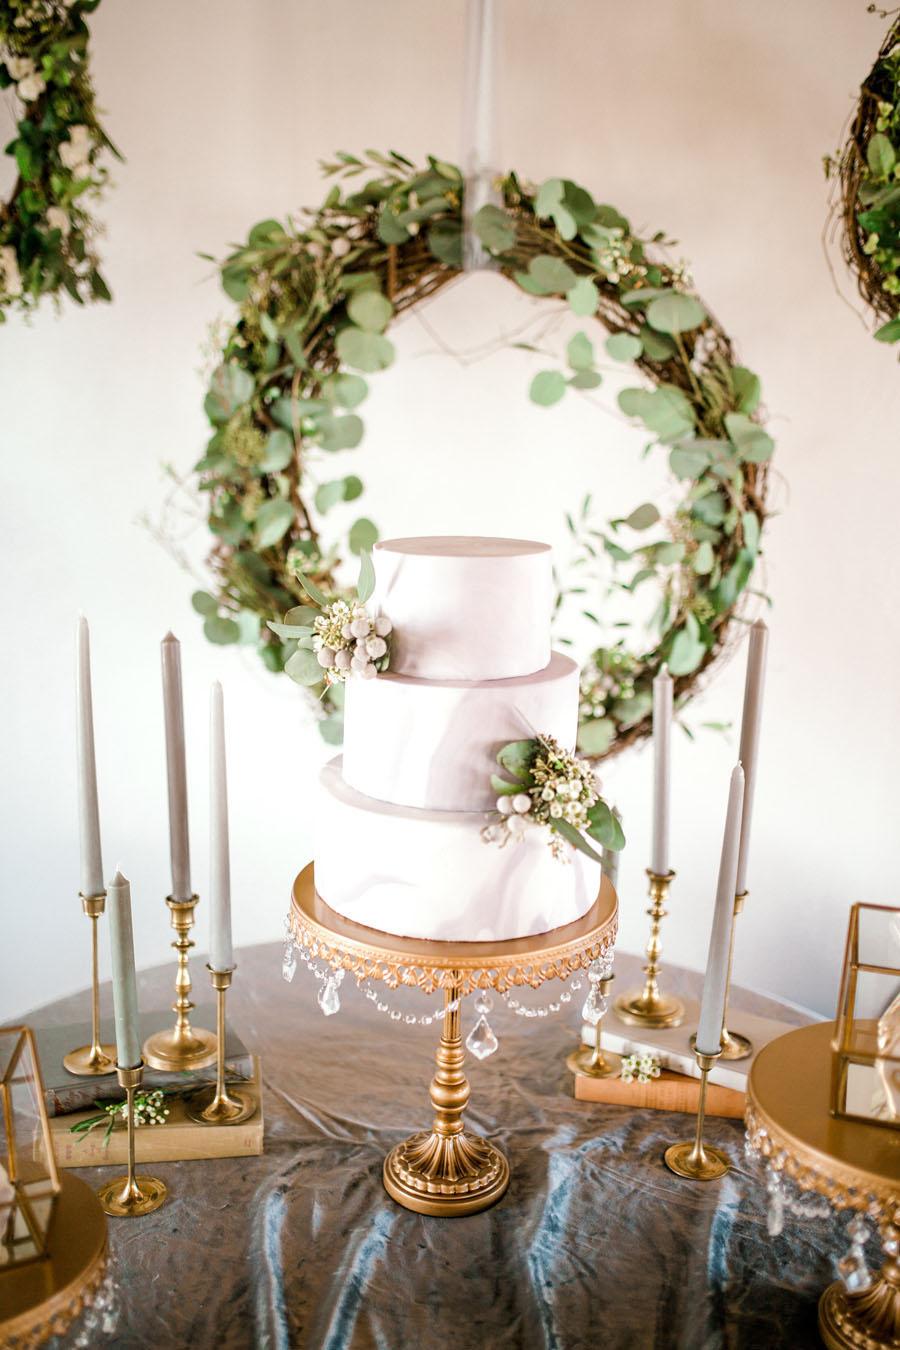 cake: Tina's Treats of Texas  photo: Sparrow and Gold